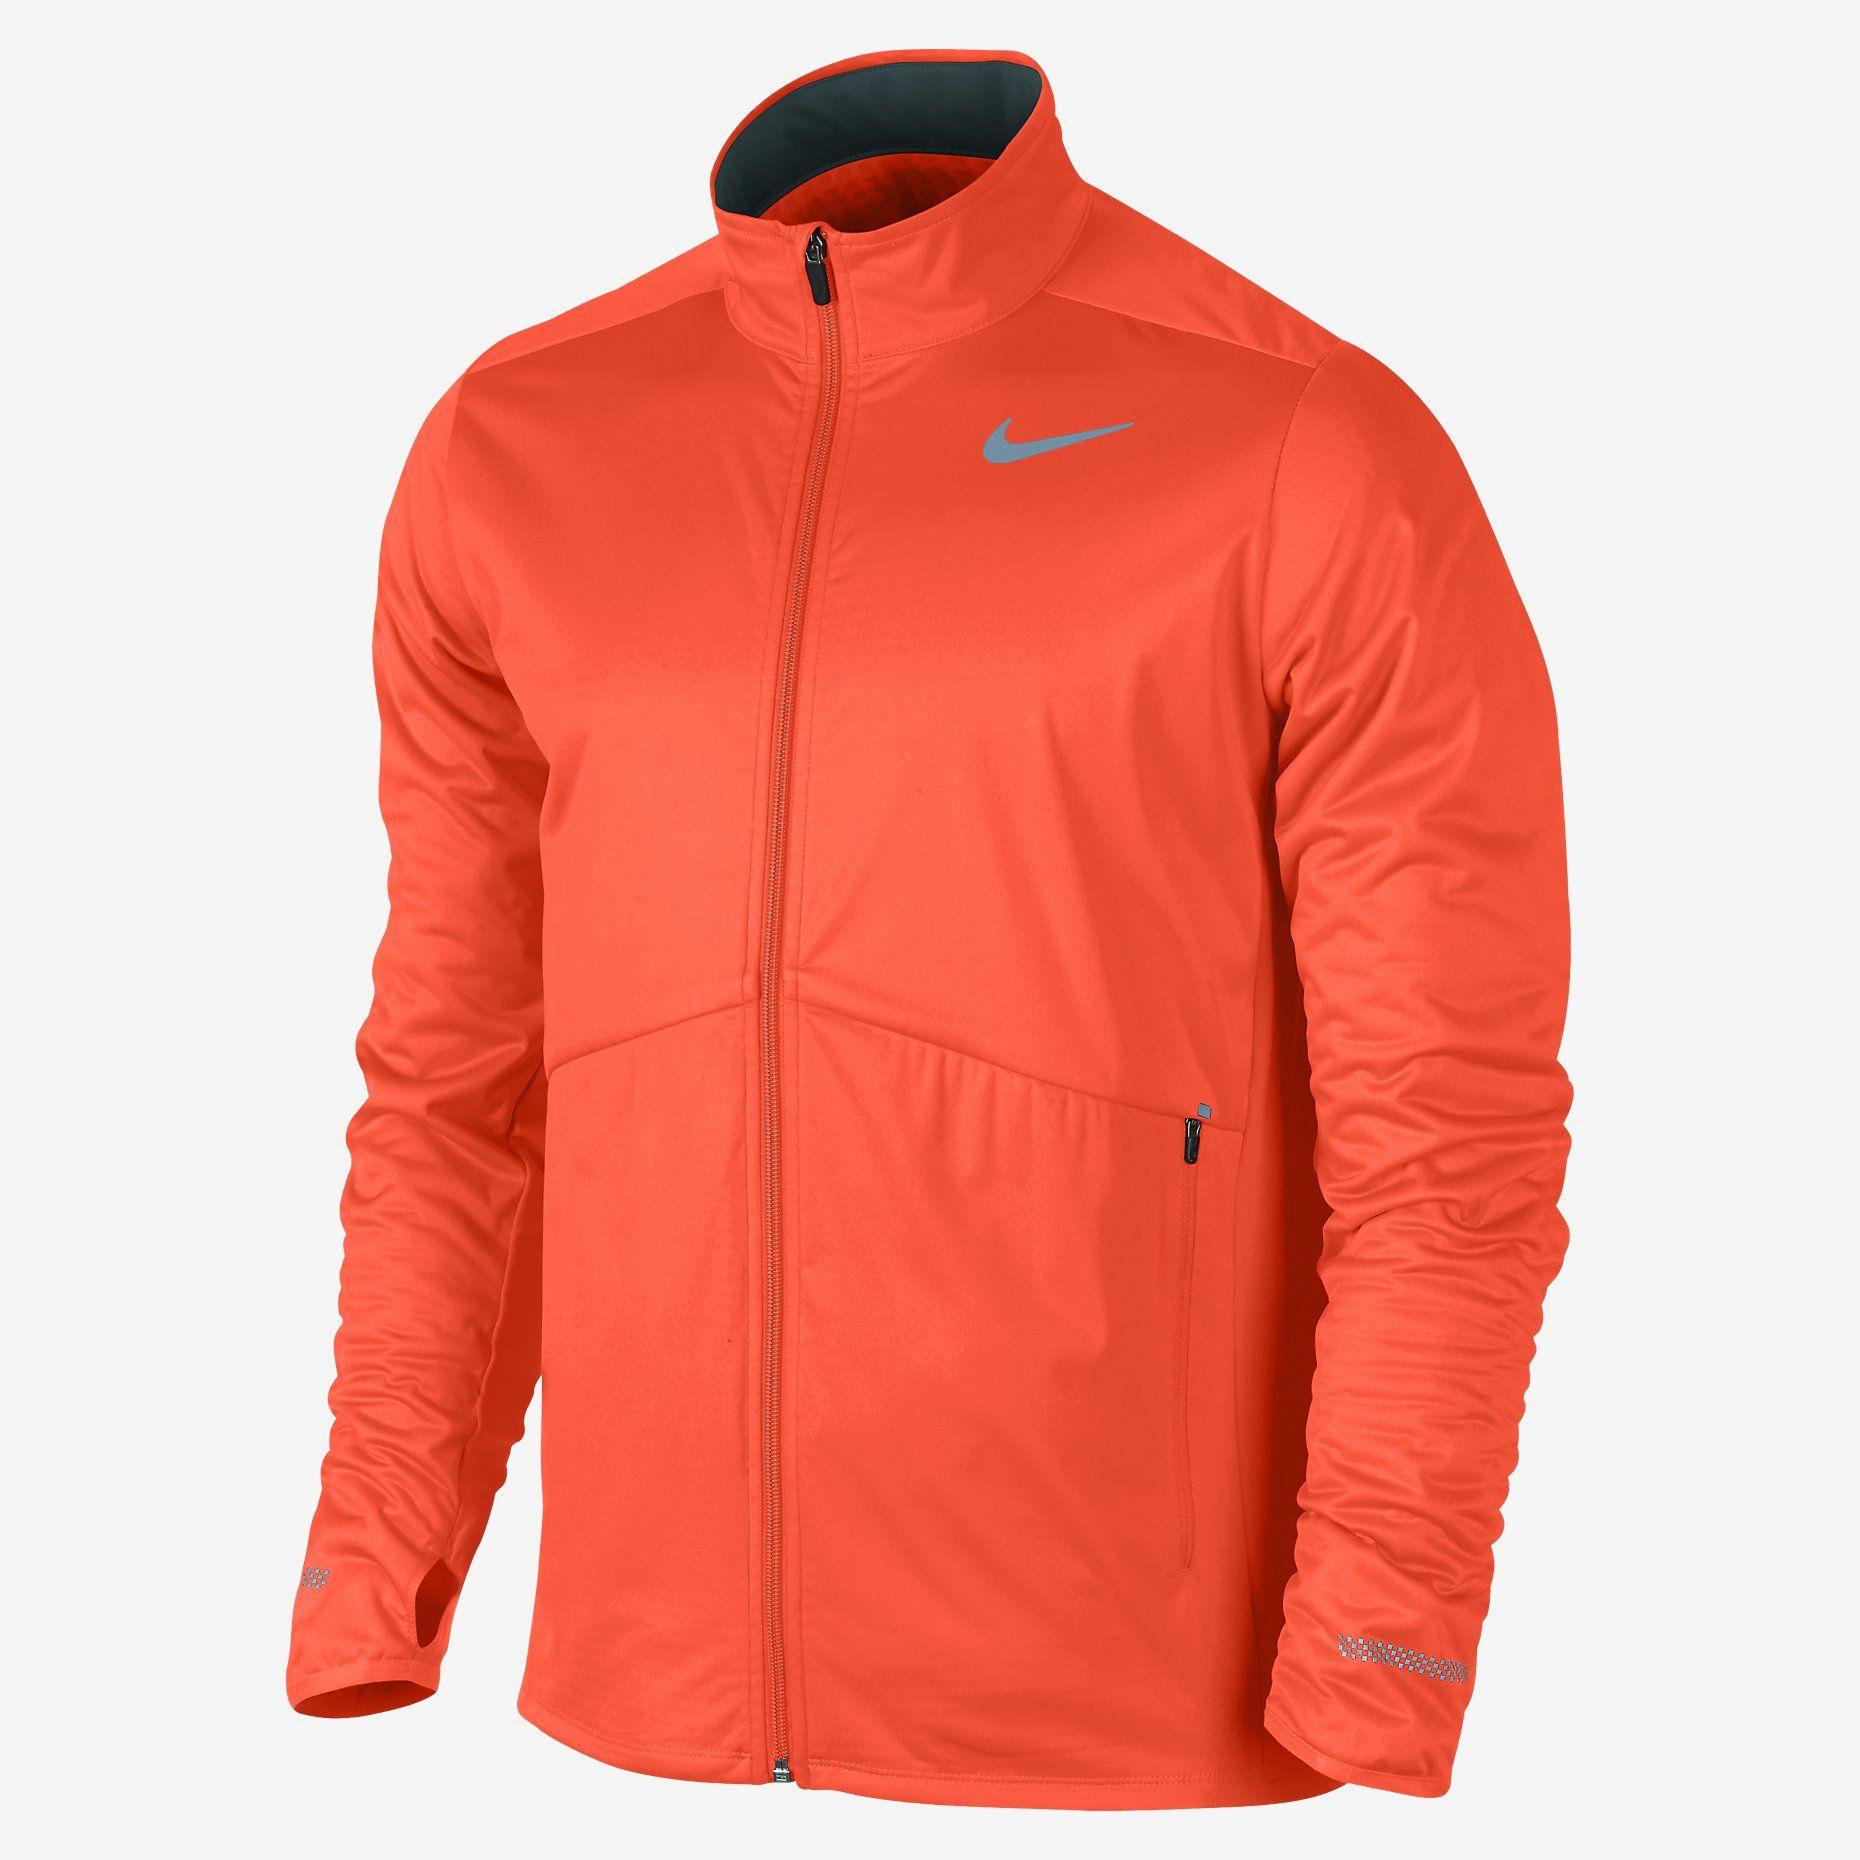 Nike Element Full-Zip Men's Running Jacket